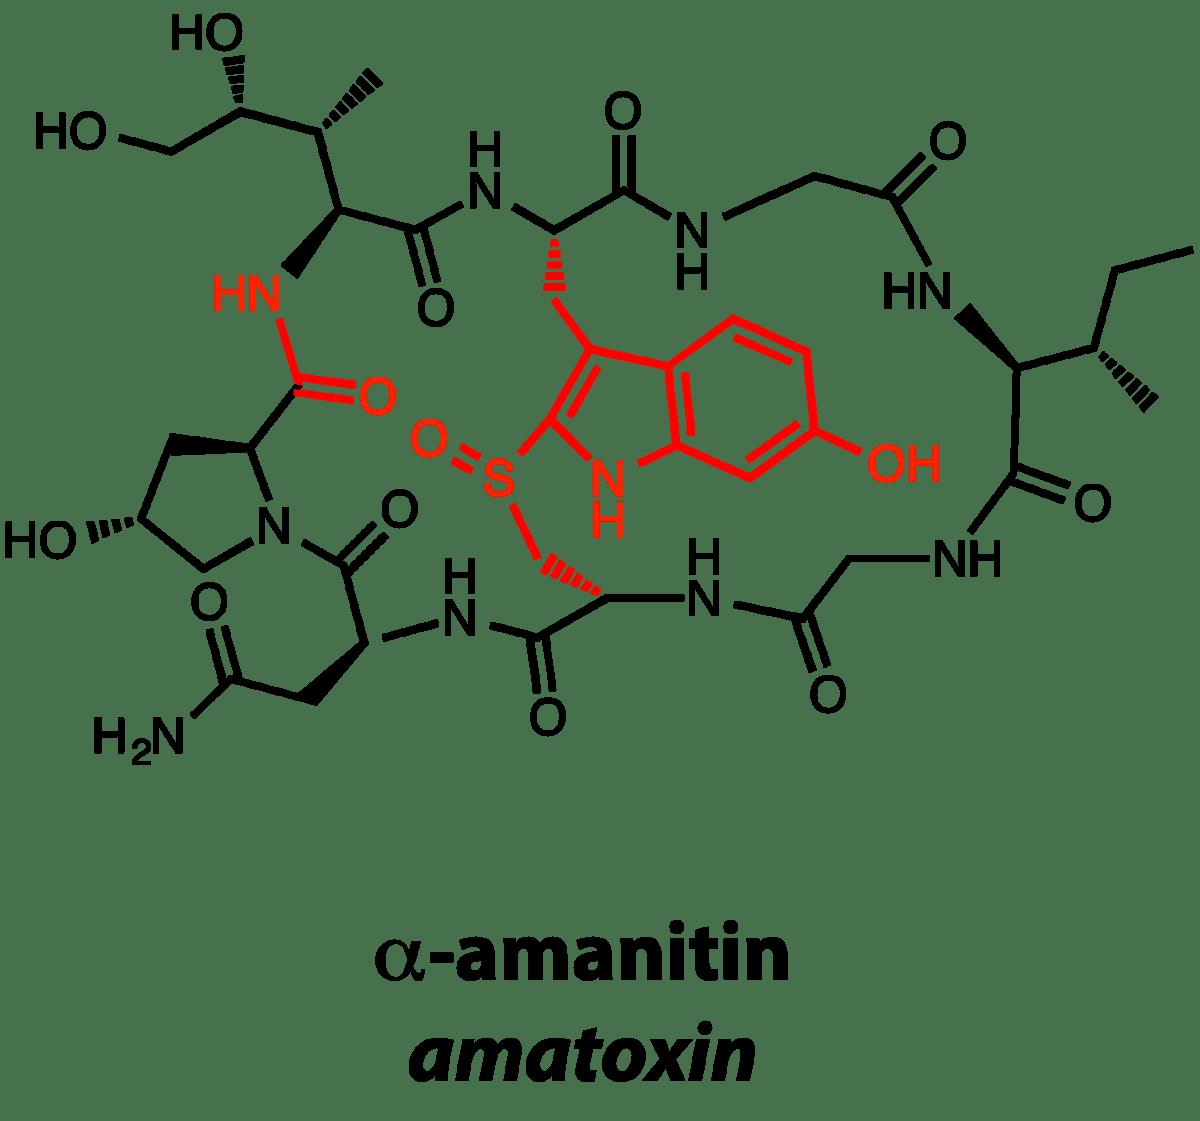 Ribosomally synthesized and post-translationally modified